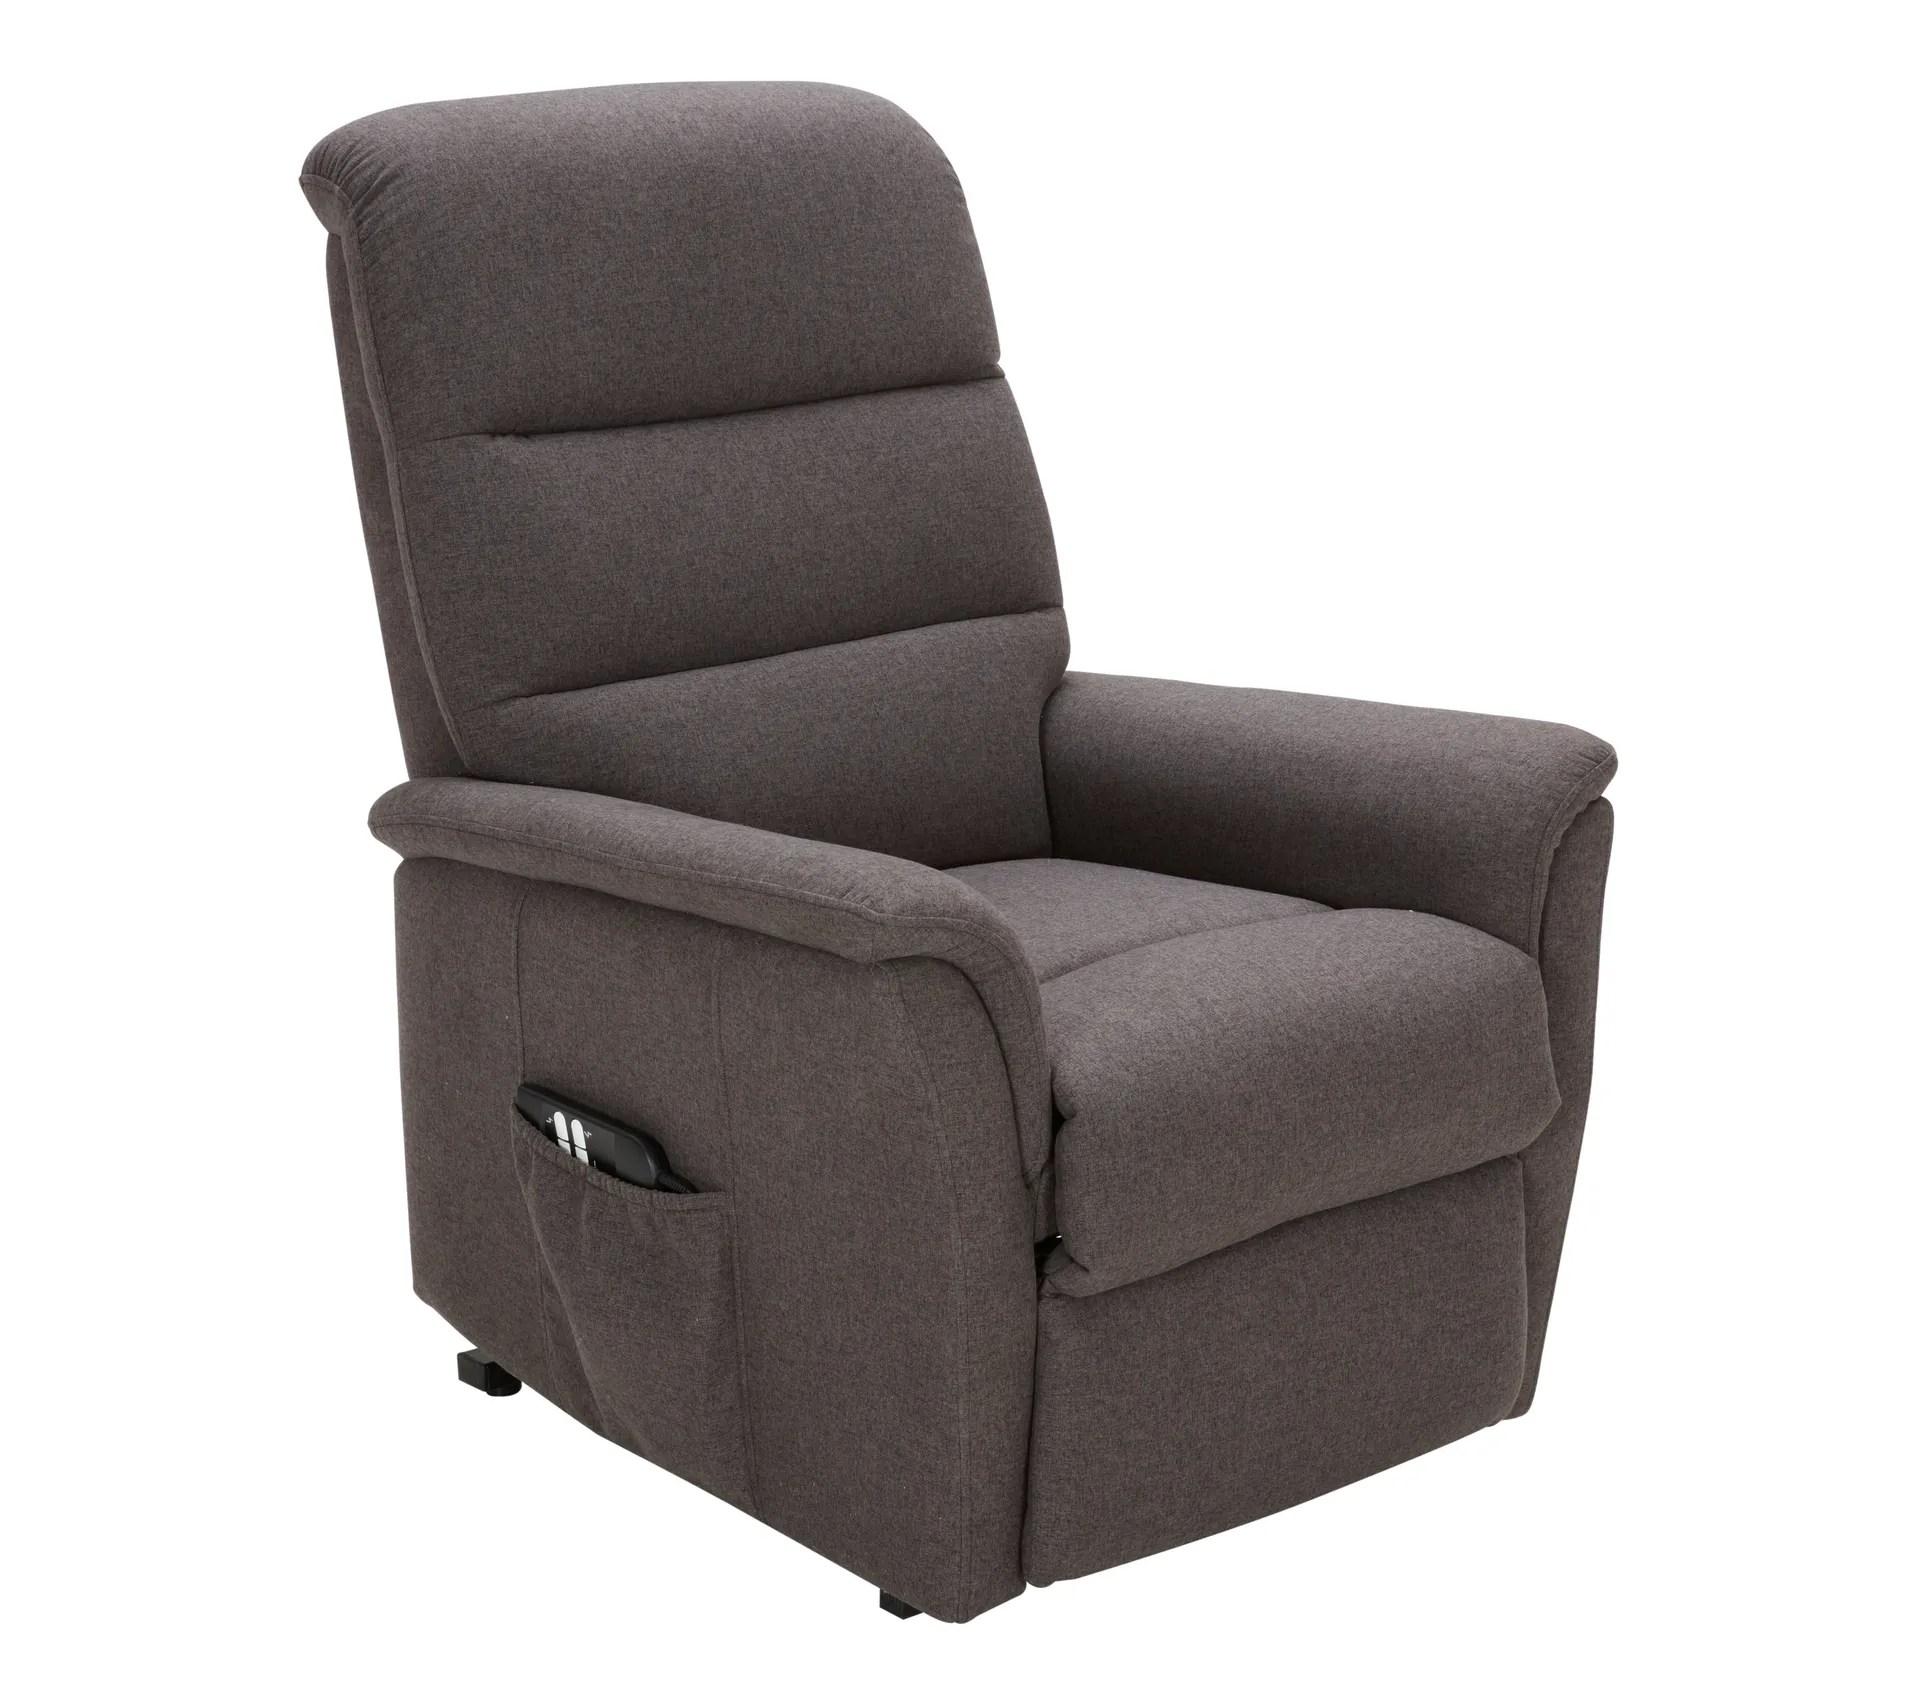 fauteuil relax releveur 2 moteurs kennedy tissu gris fonce